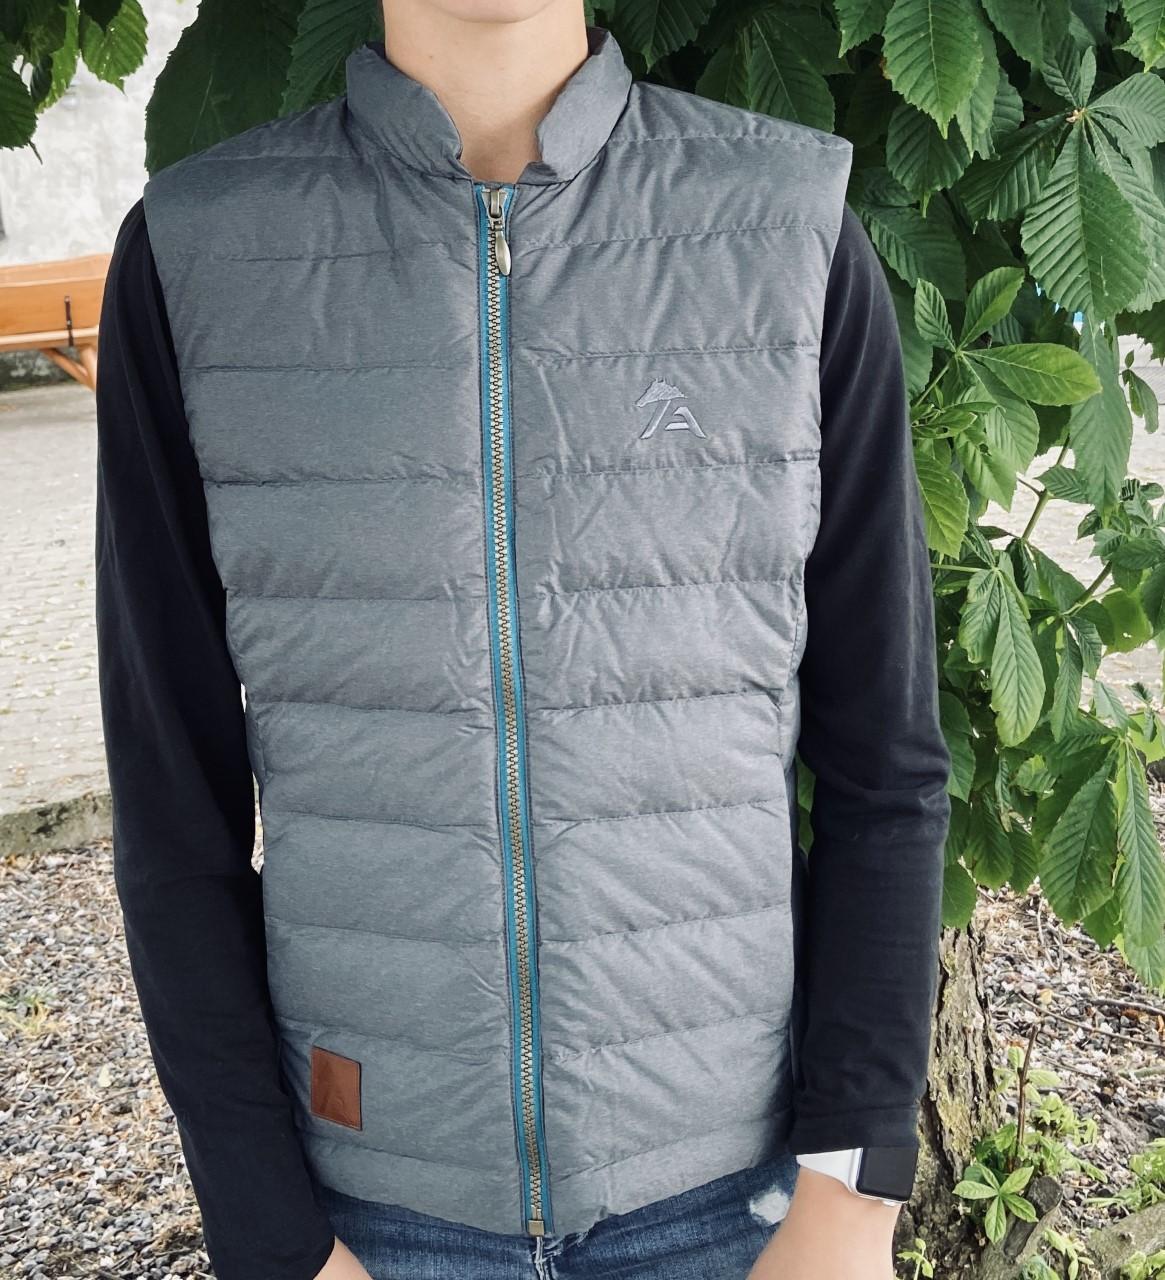 A-Equipment vest